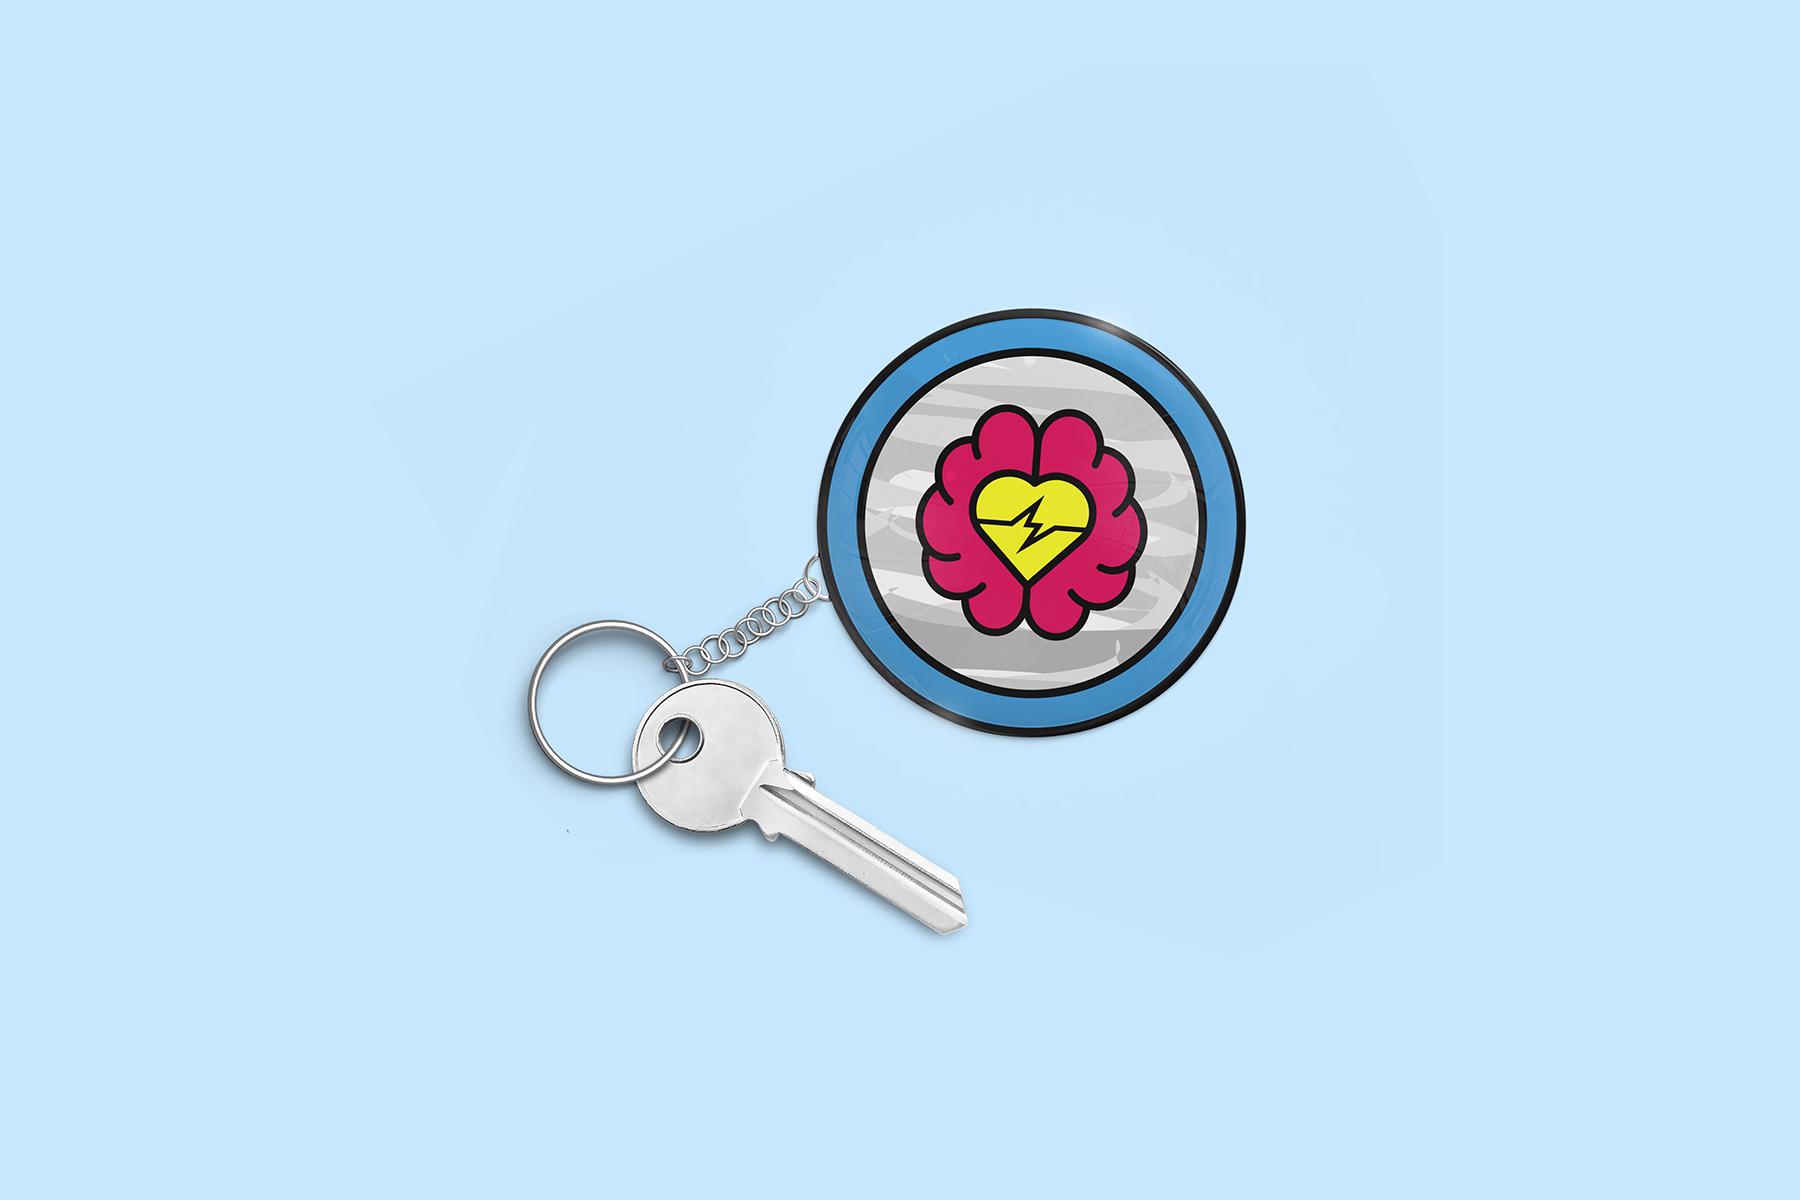 JALASTAIR Sober Mind Keychain